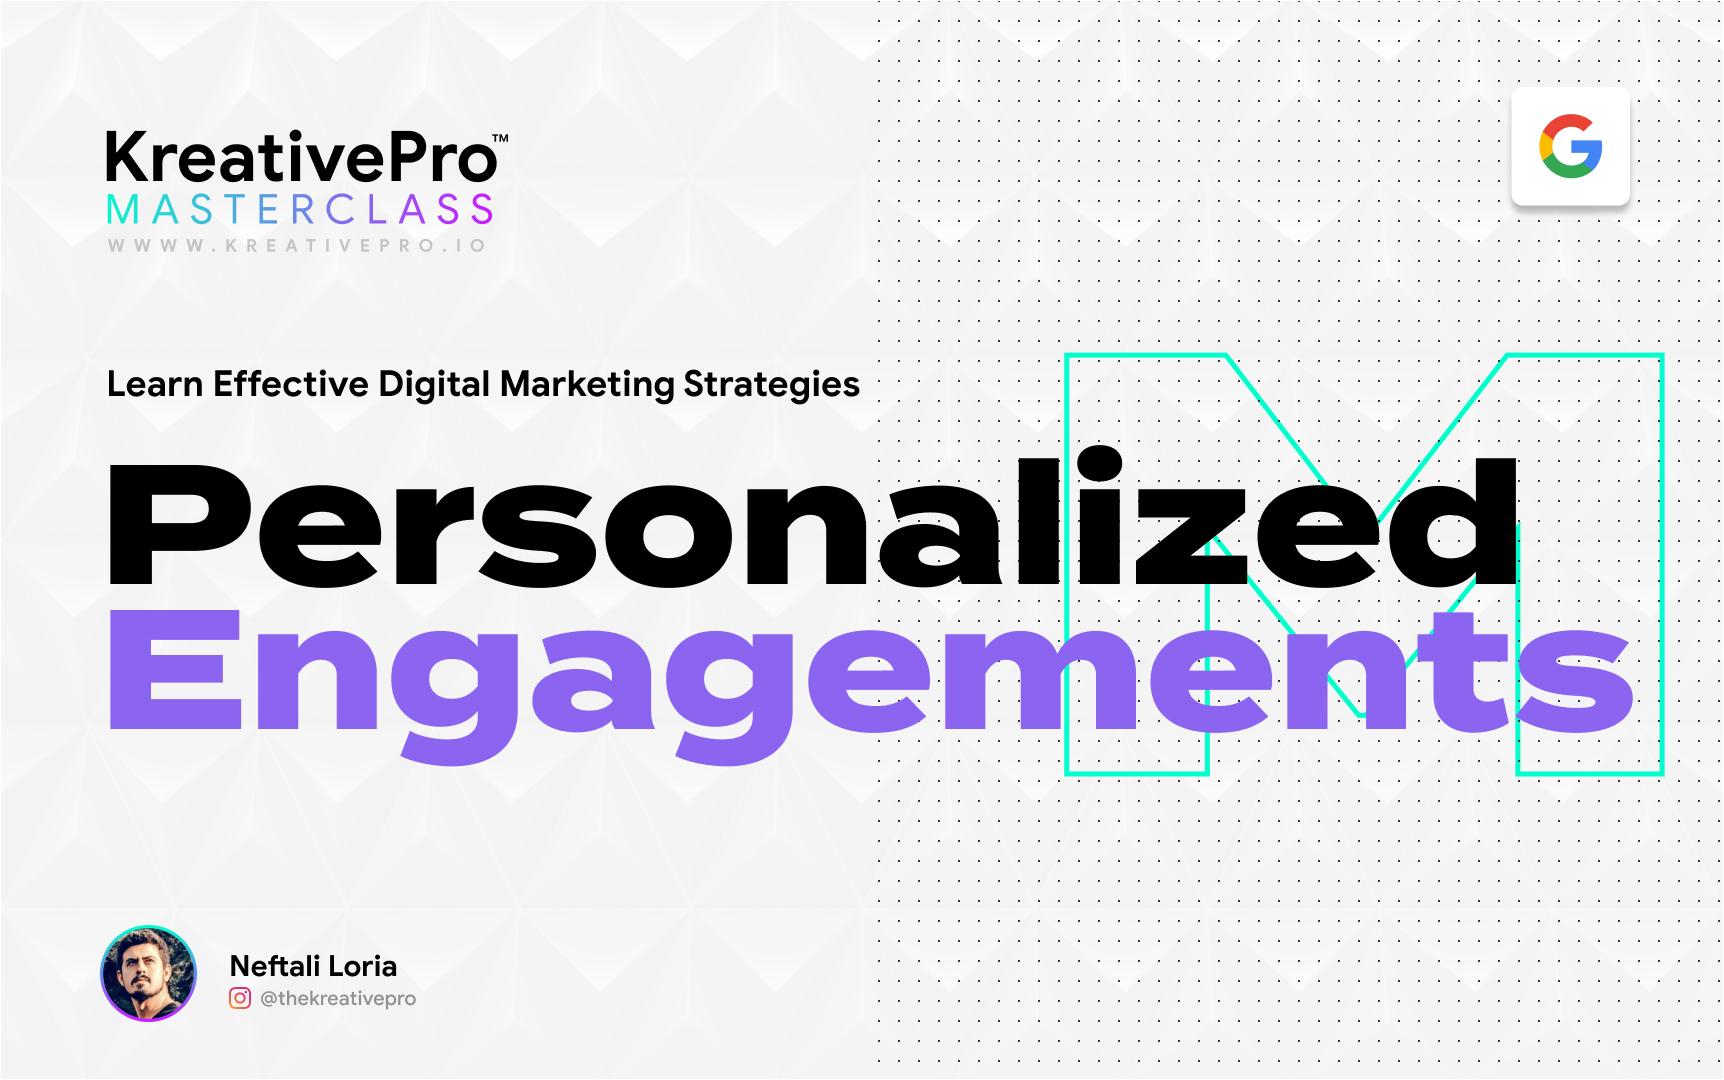 Marketing 4.1 - Personalized Engagement